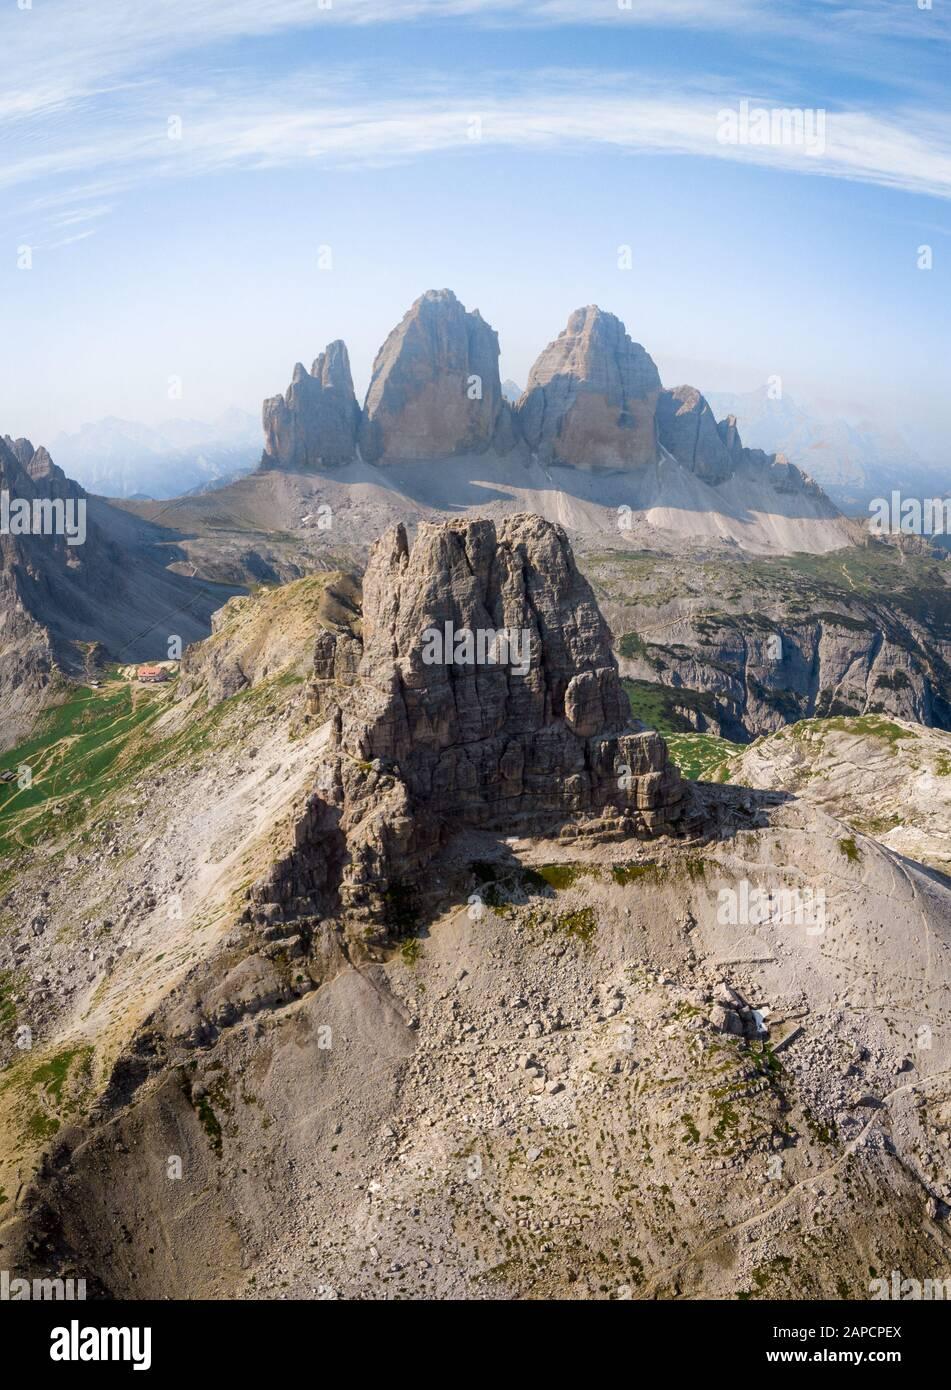 Torre Di Toblin/ Cime Di Lavaredo, Tyrol Du Sud, Italie Banque D'Images